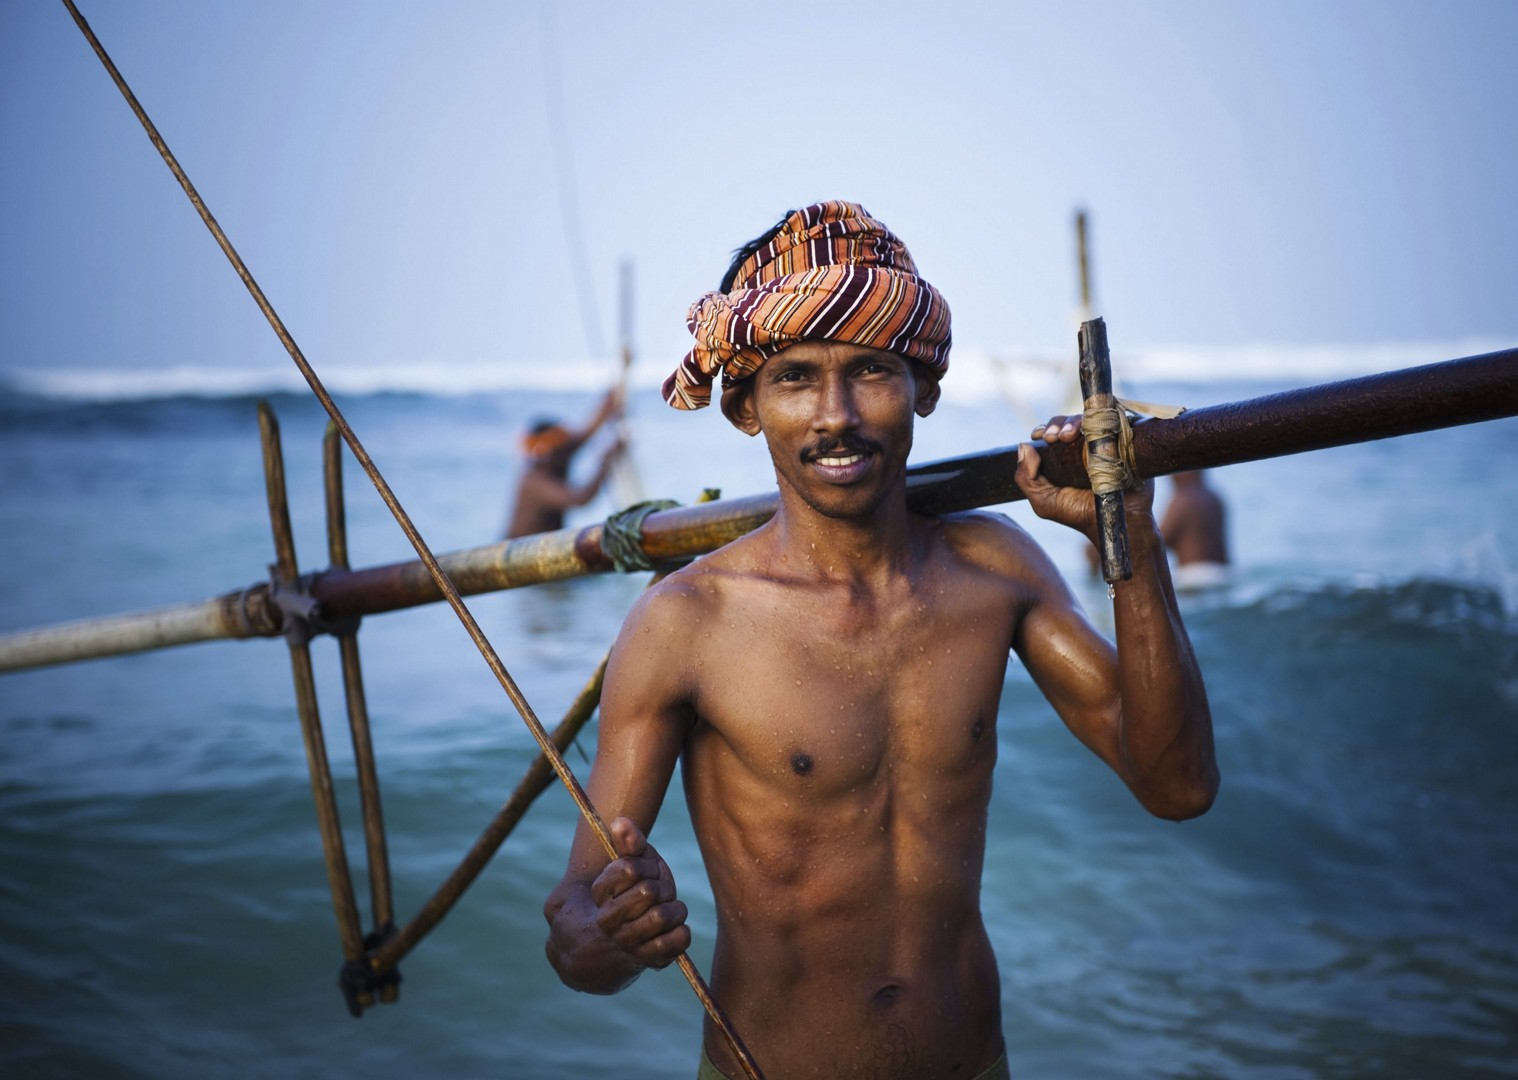 coastal-authetic-locals-on-holiday-sri-lanka.jpg - Sri Lanka - Backroads and Beaches - Cycling Adventures